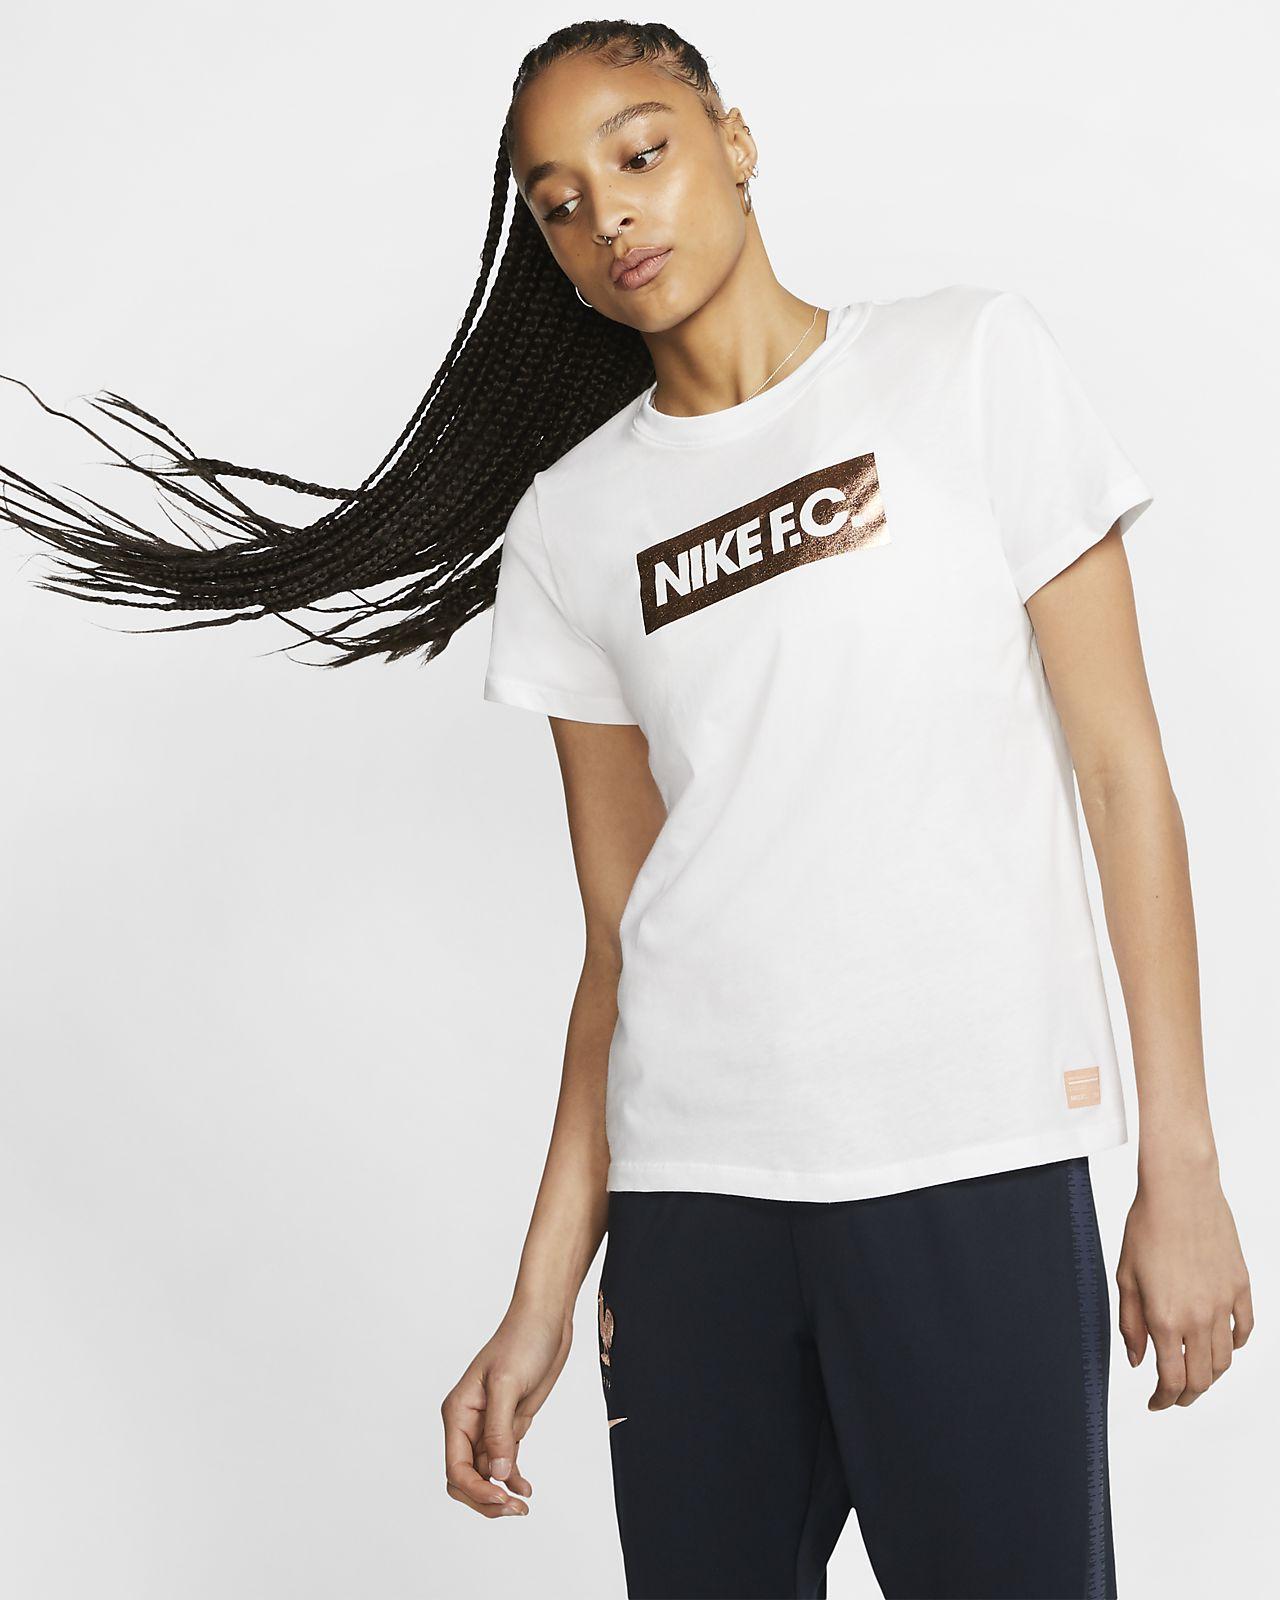 Nike F.C. Women's Football T Shirt